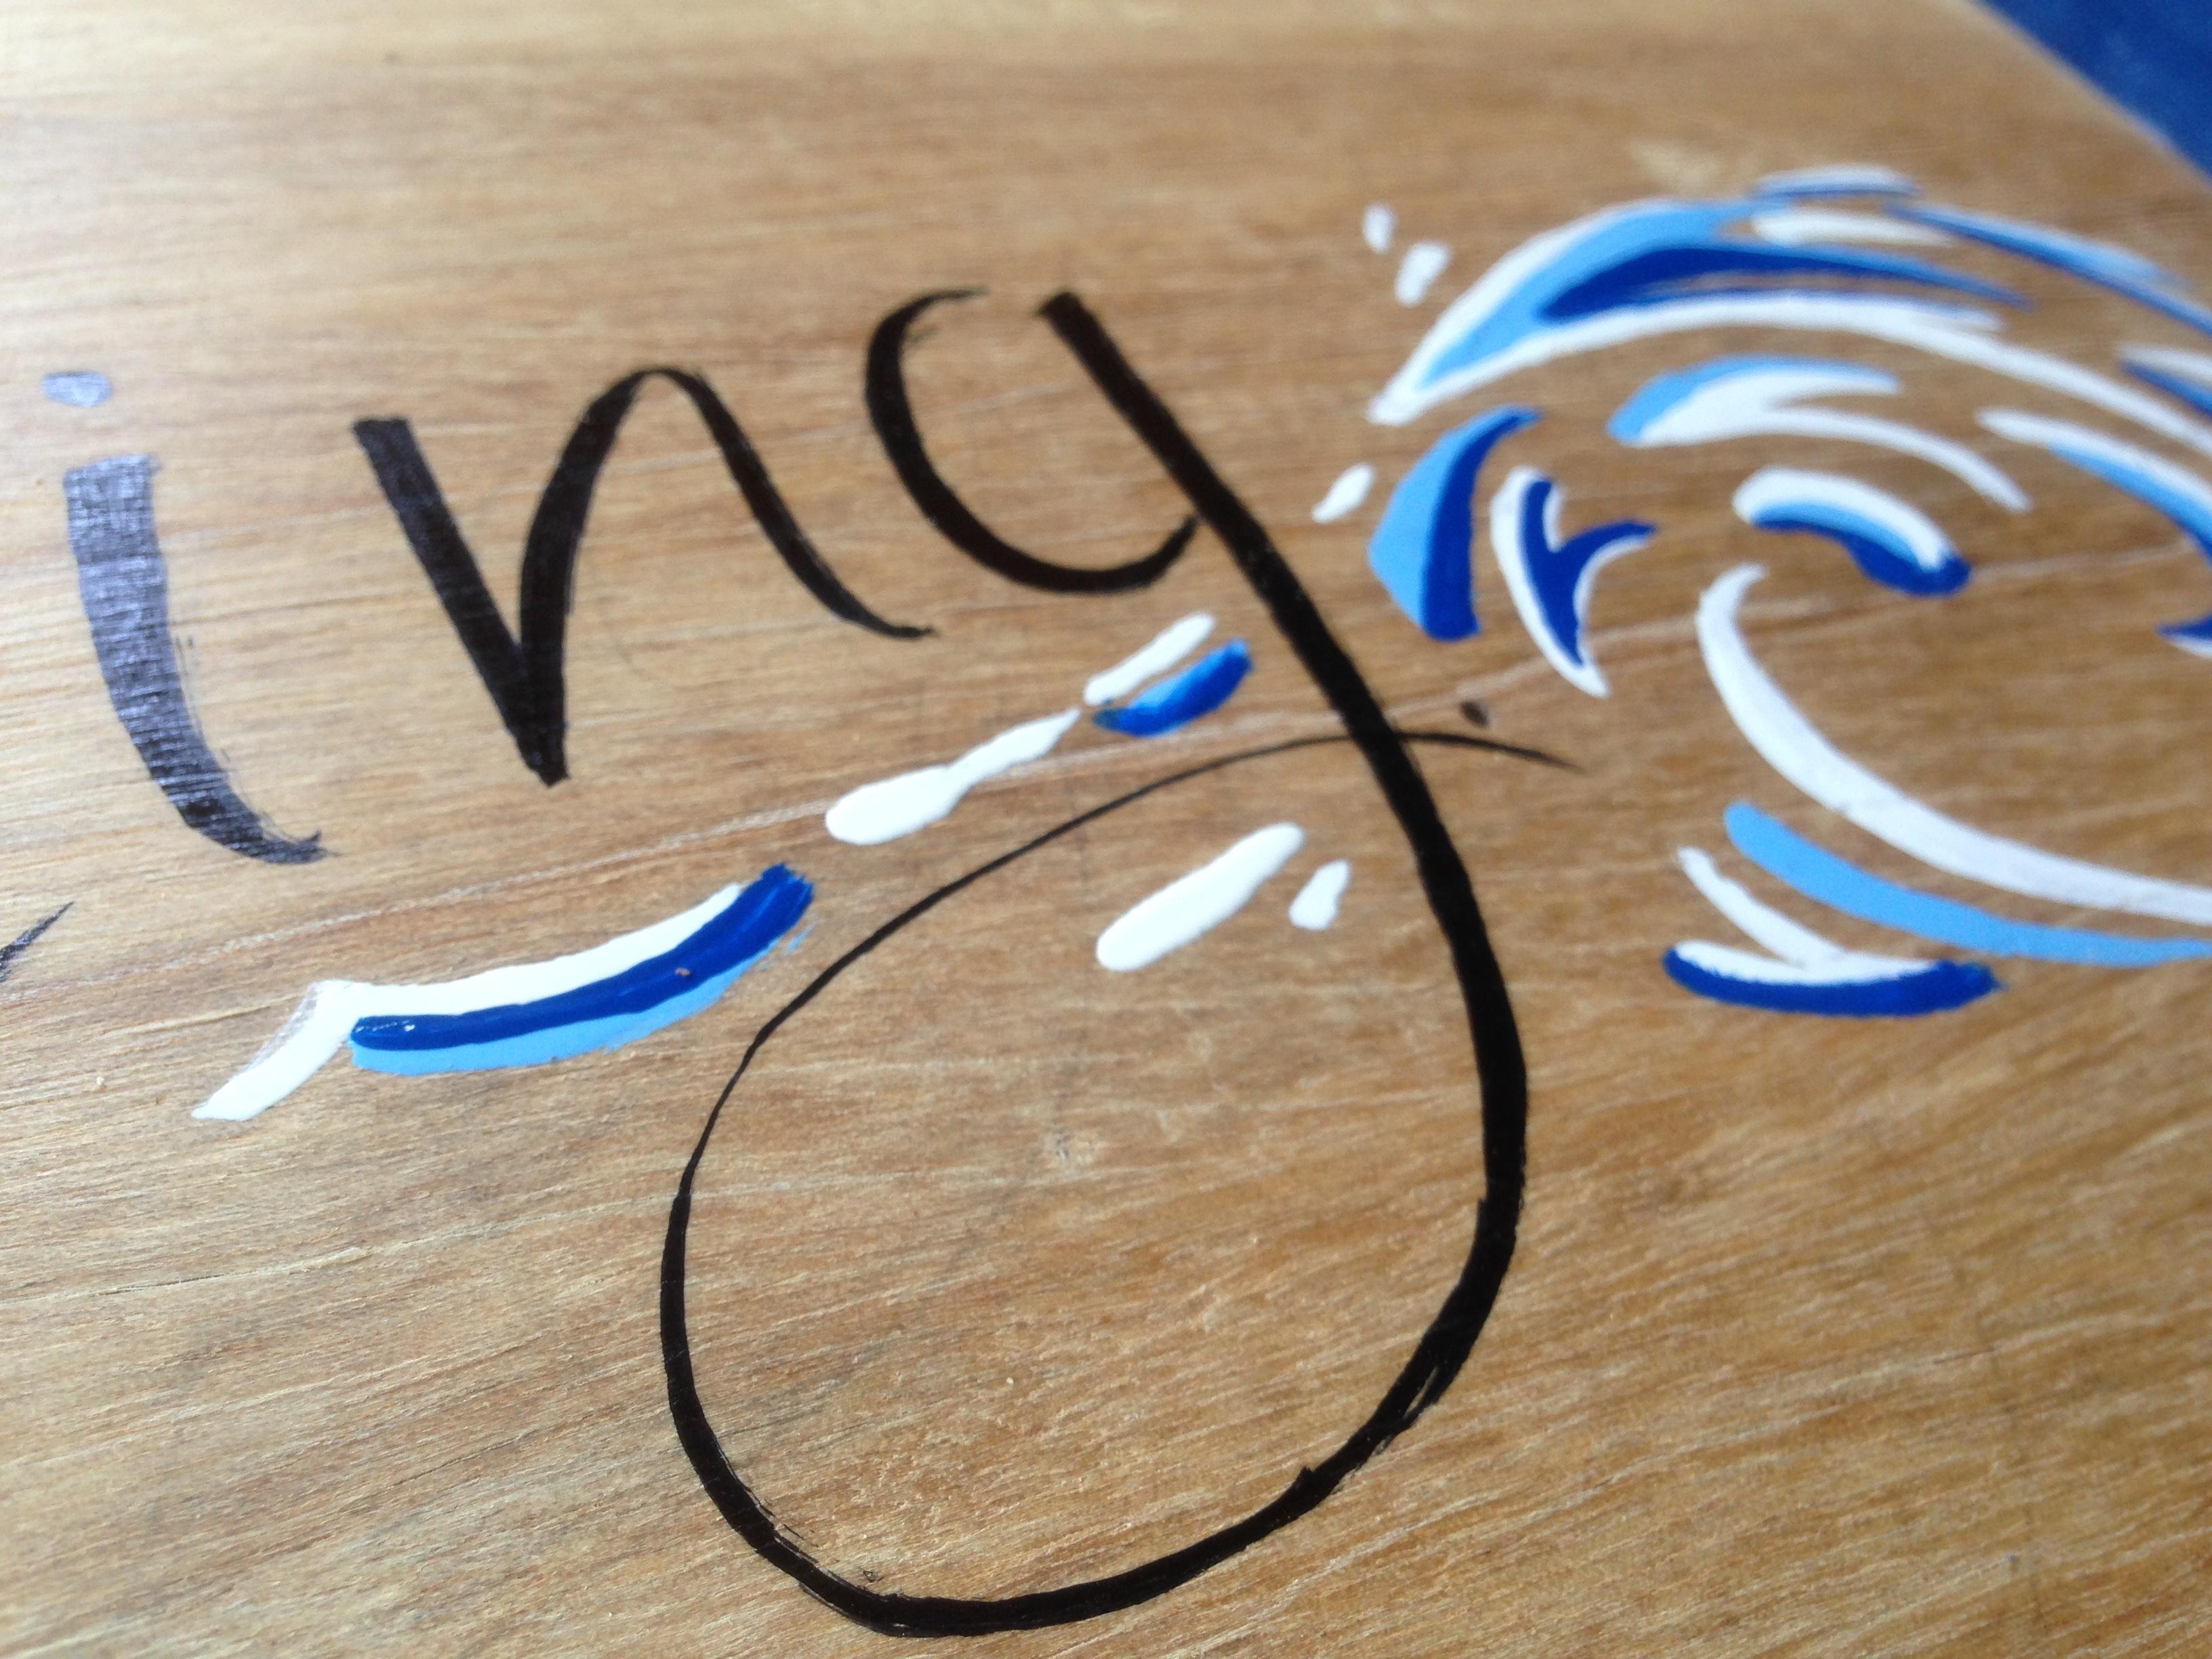 Chalkboard writing sign painting portfolio